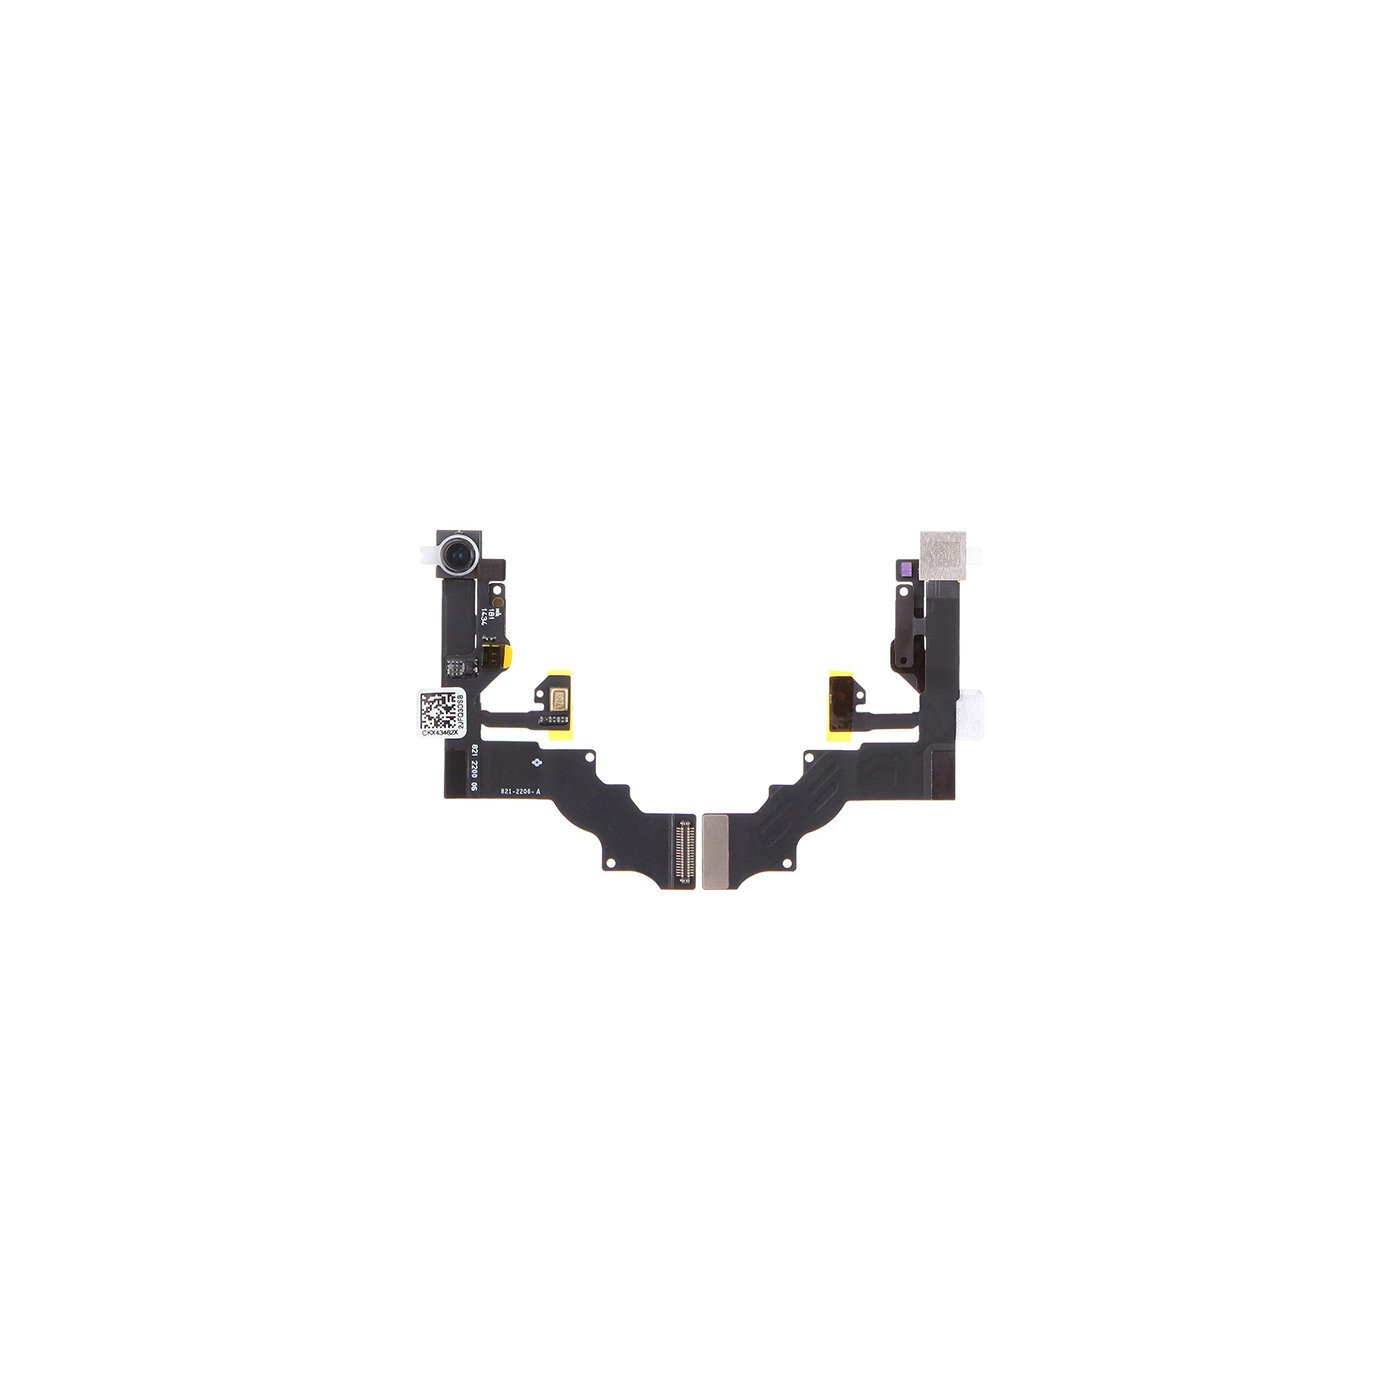 Flat flex fotocamera frontale per Apple iPhone 6 Plus con sensore luminosita camera